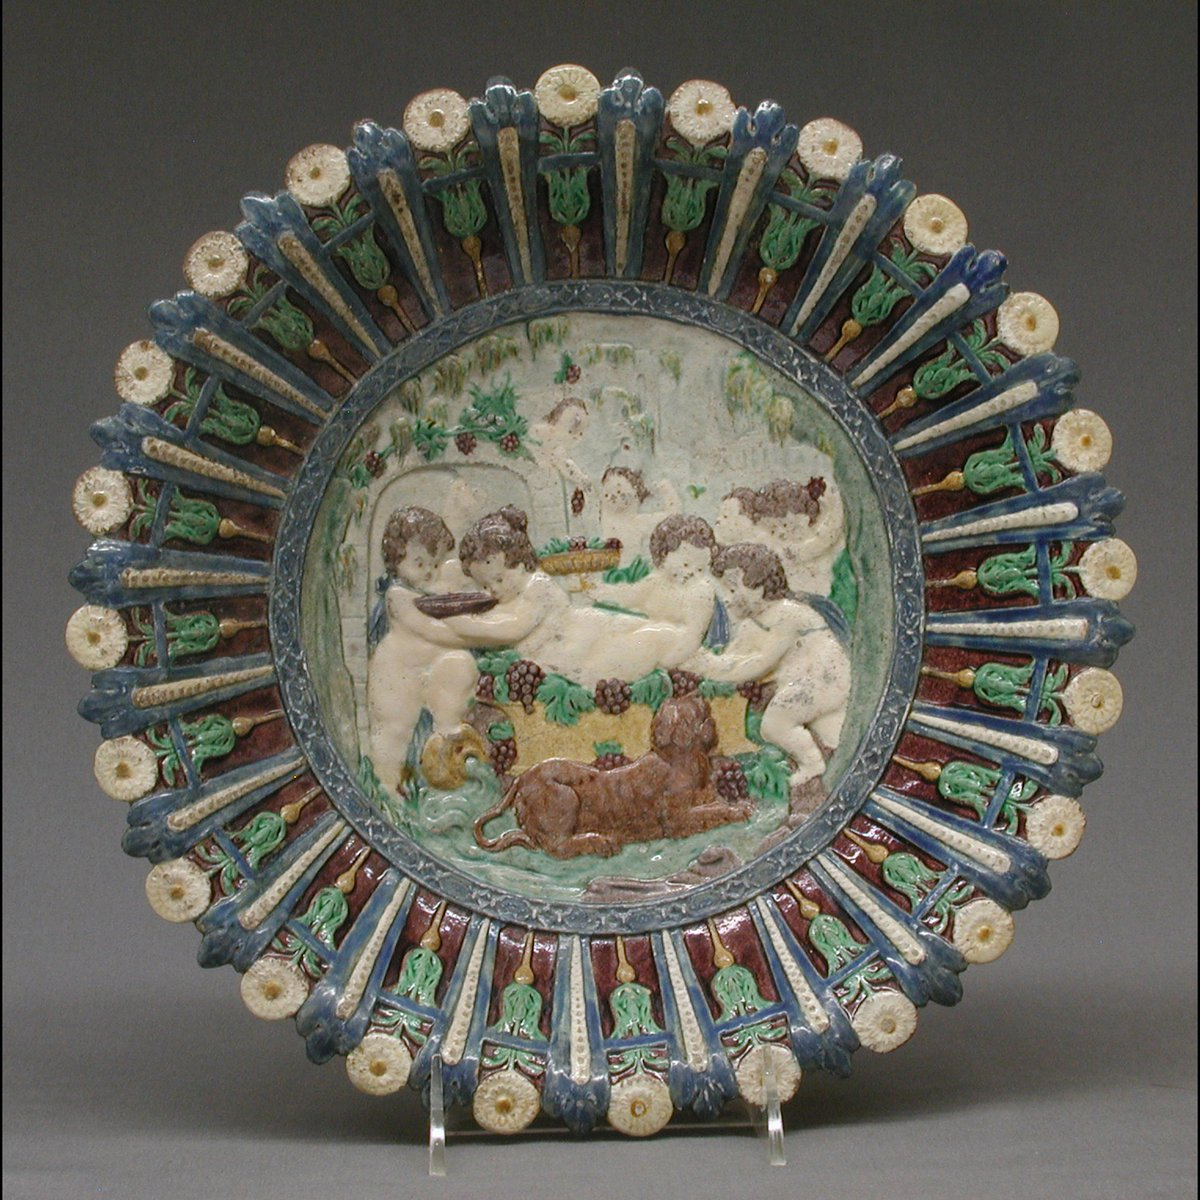 Dish with childhood of Bacchus Dish created by: Bernard Palissy  #art #artwork #artlover #artaccount #arte #アート #艺术 #BernardPalissy https://t.co/EY2kXuBqbU